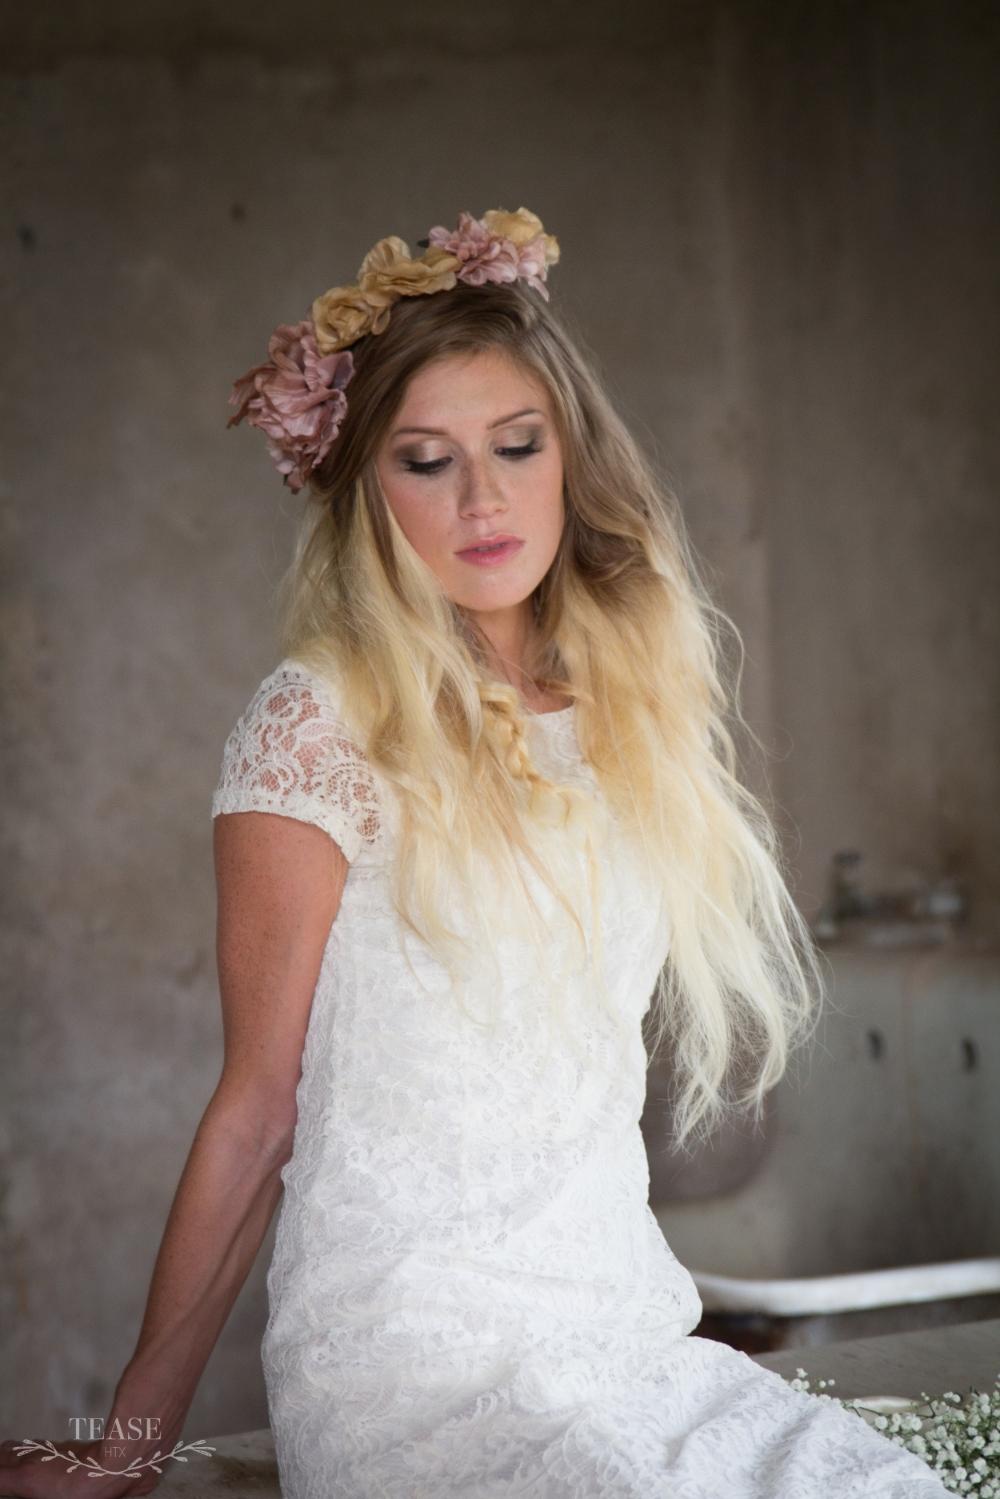 houston-bridal-hair-down-makeup-gold-airbrush.jpg